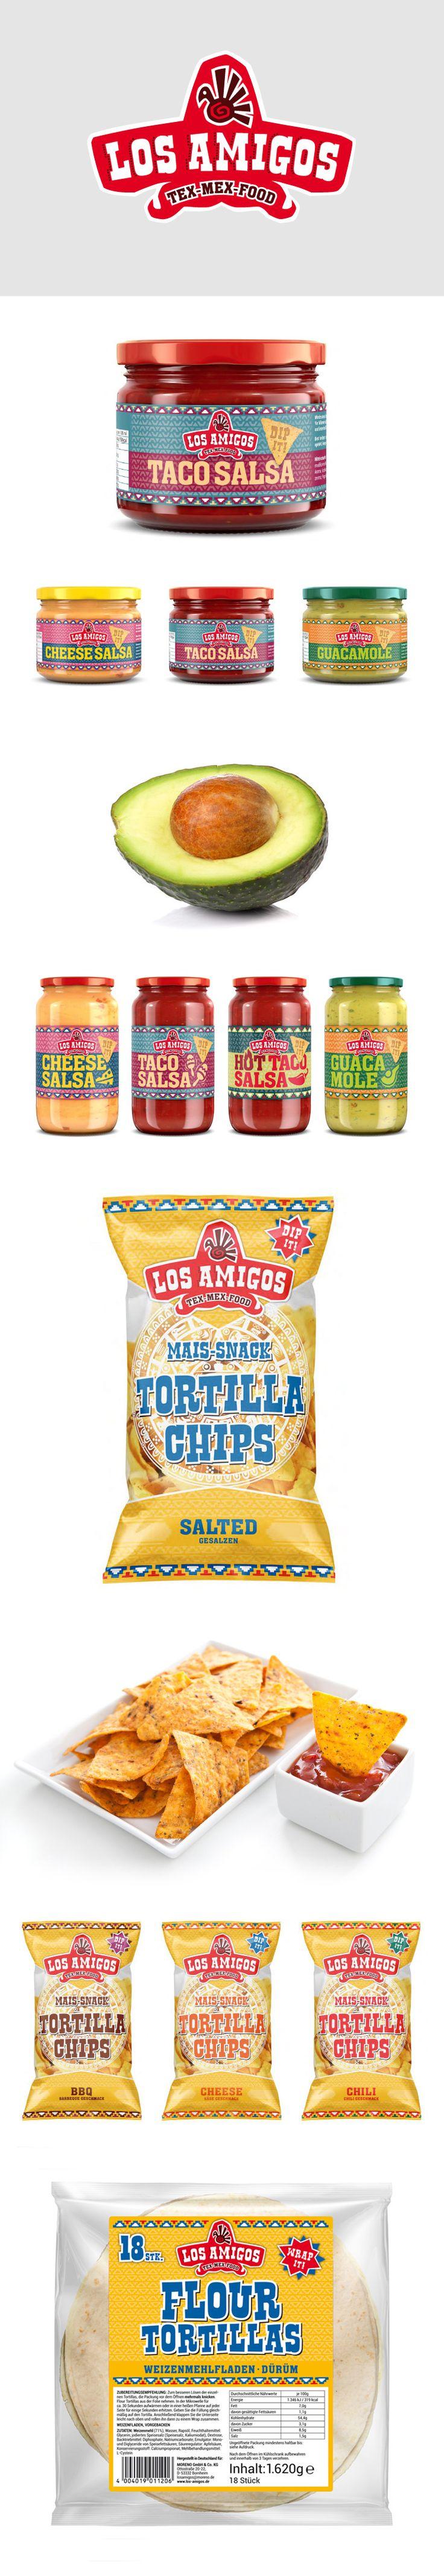 Re-Branding for Los Amigos Tex Mex Food. Packaging - Nachos - Salsa - Wraps